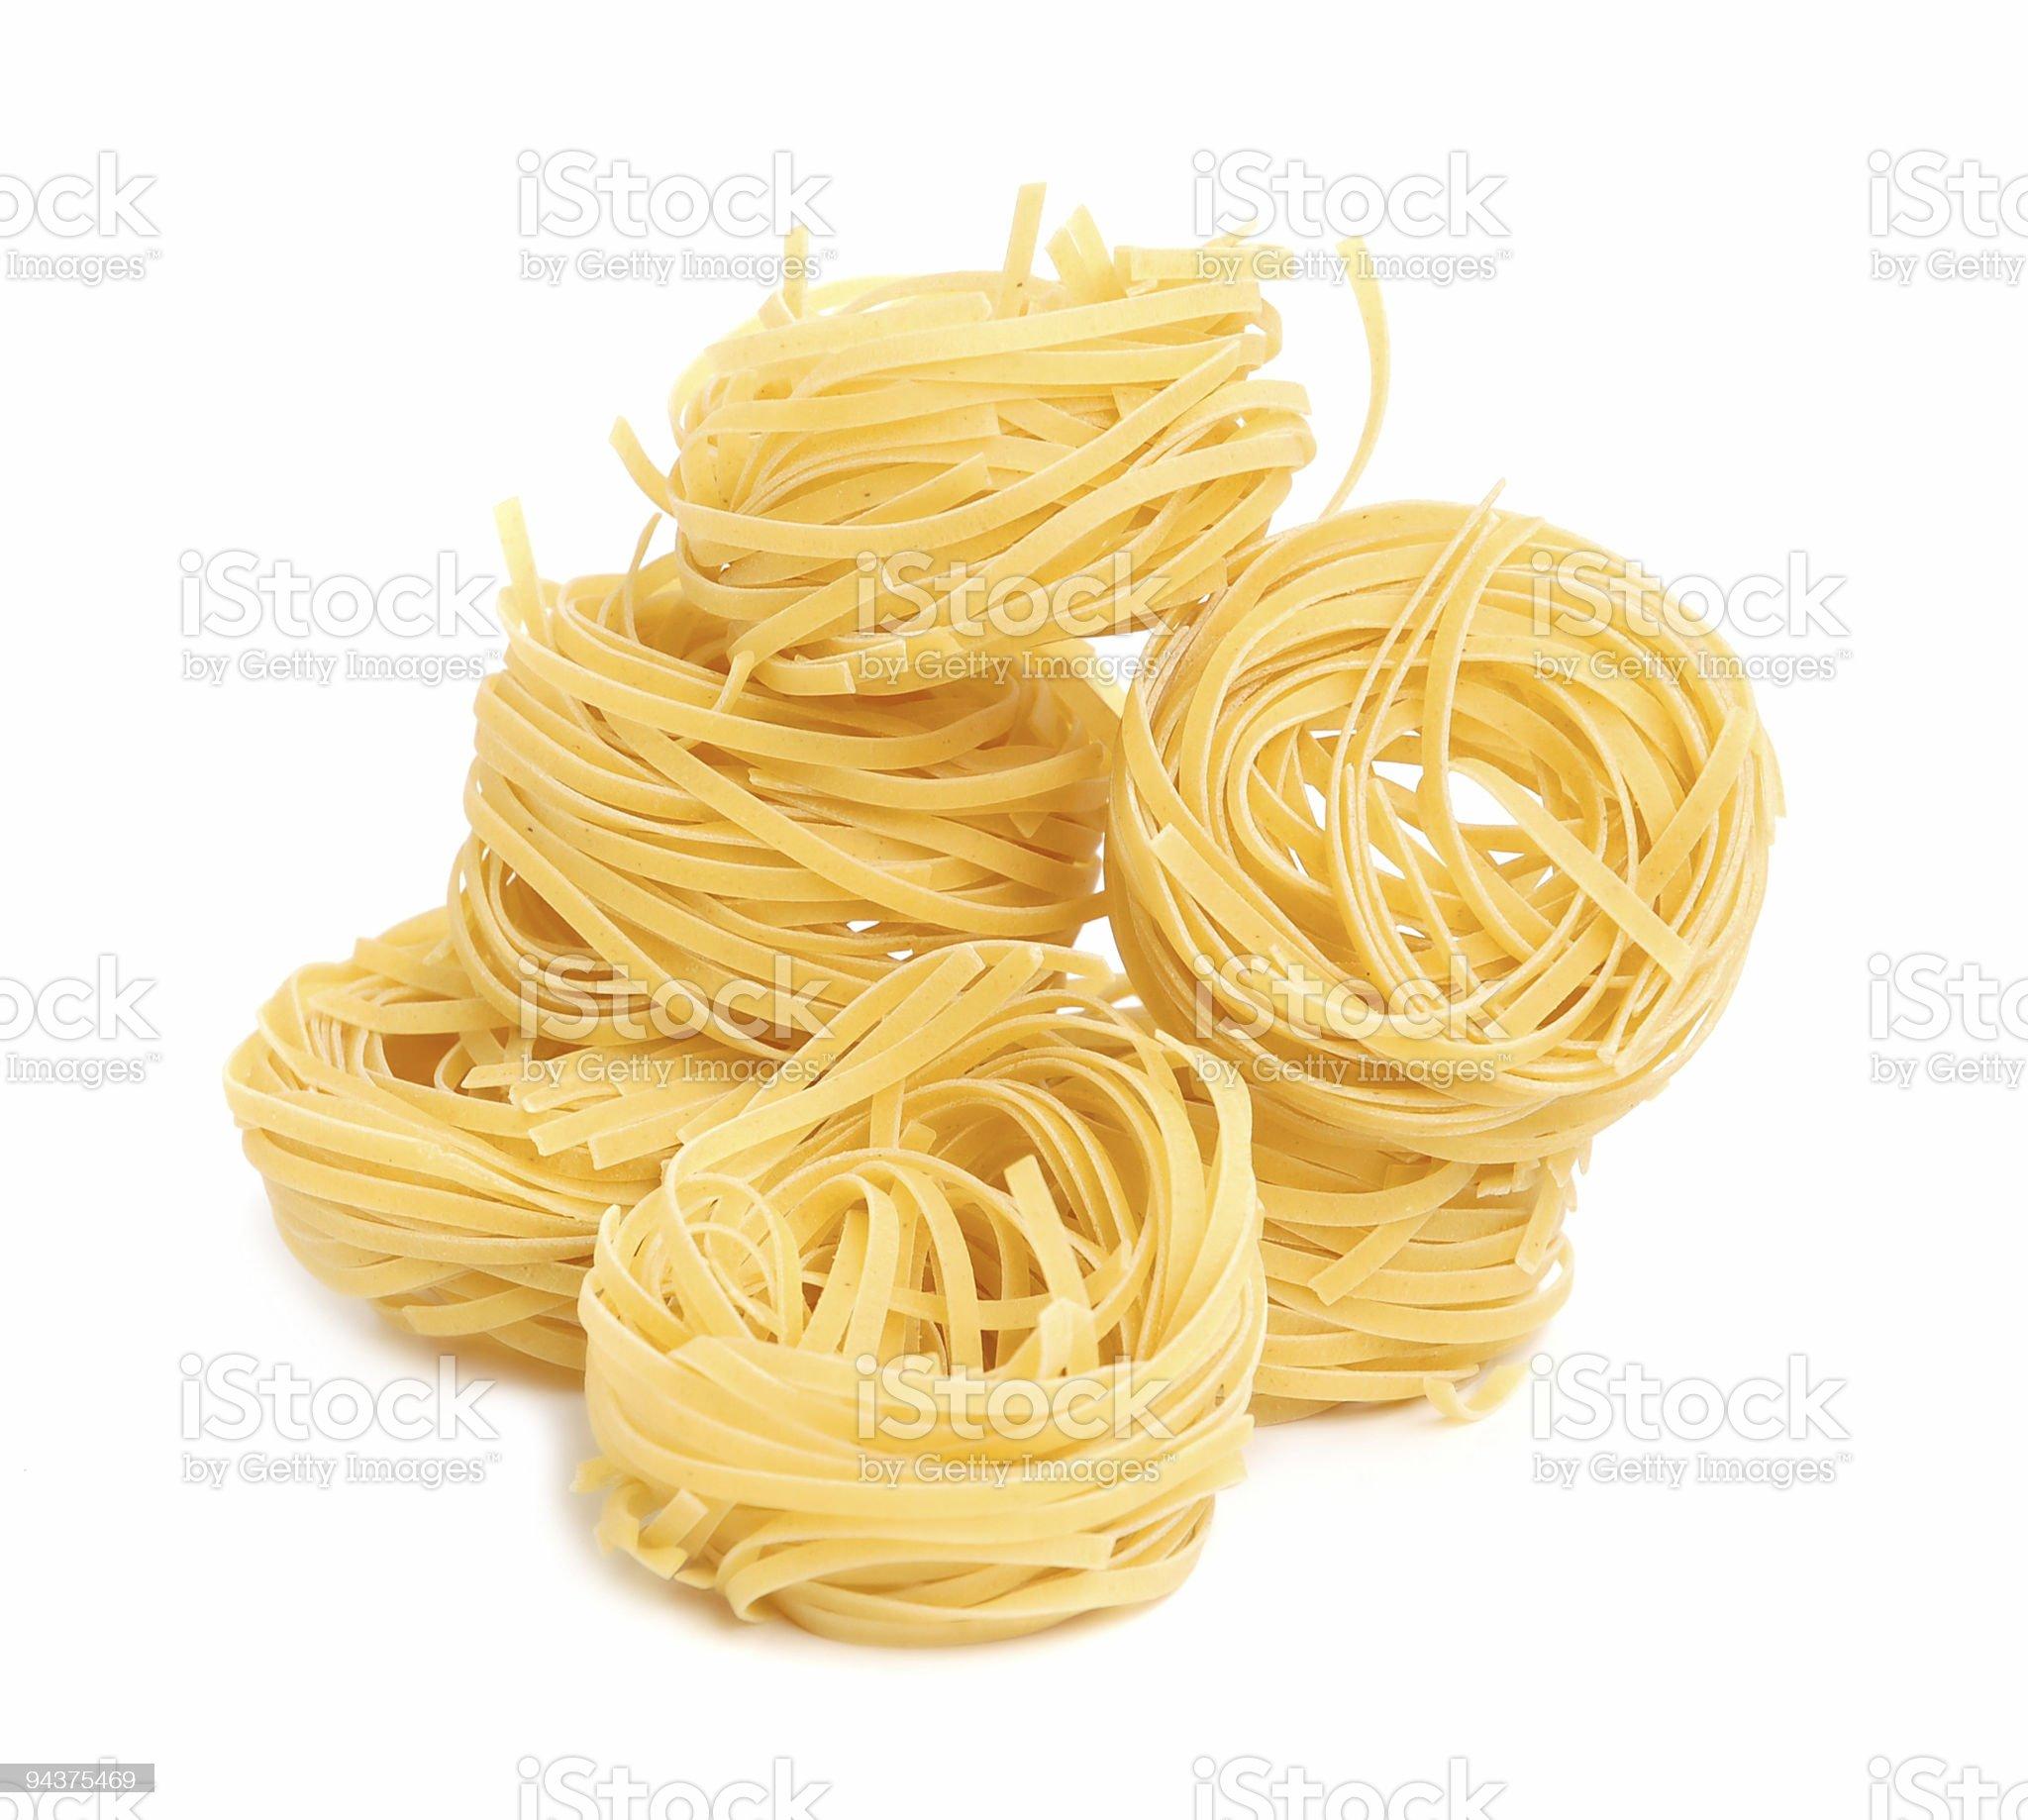 Uncooked macaroni royalty-free stock photo